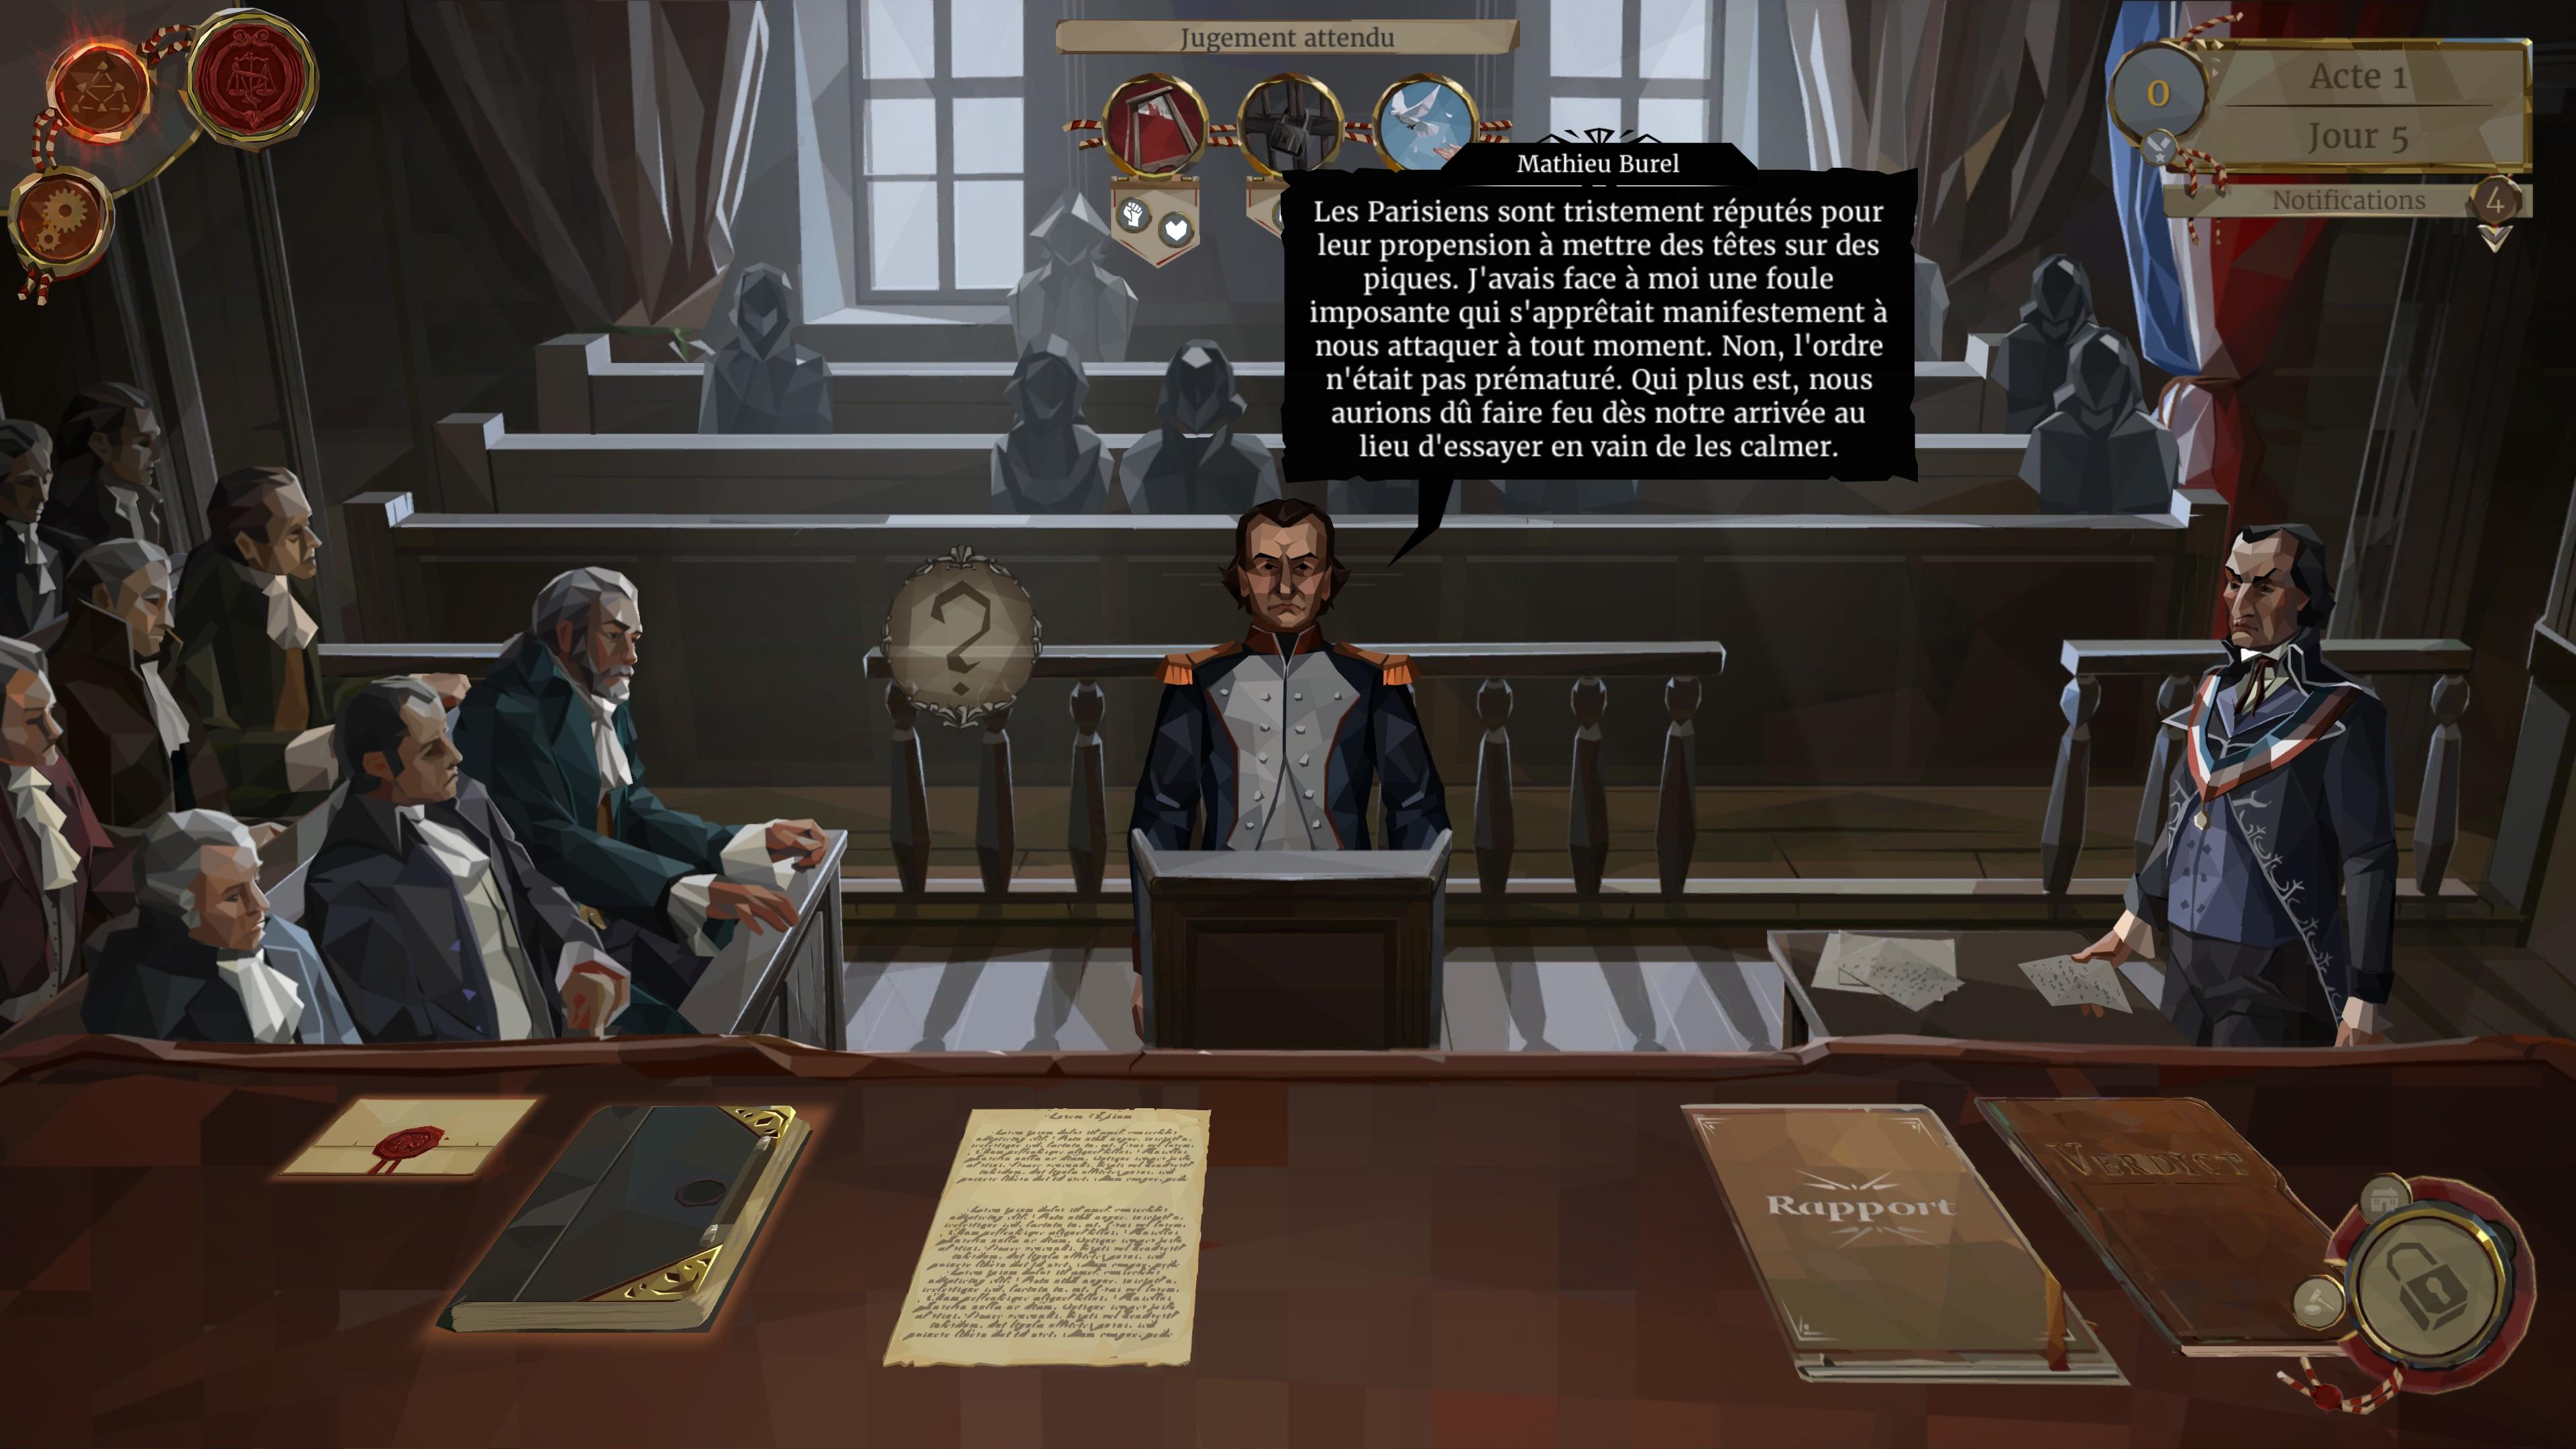 We-Revolution-Screen-gameblog-test -5-